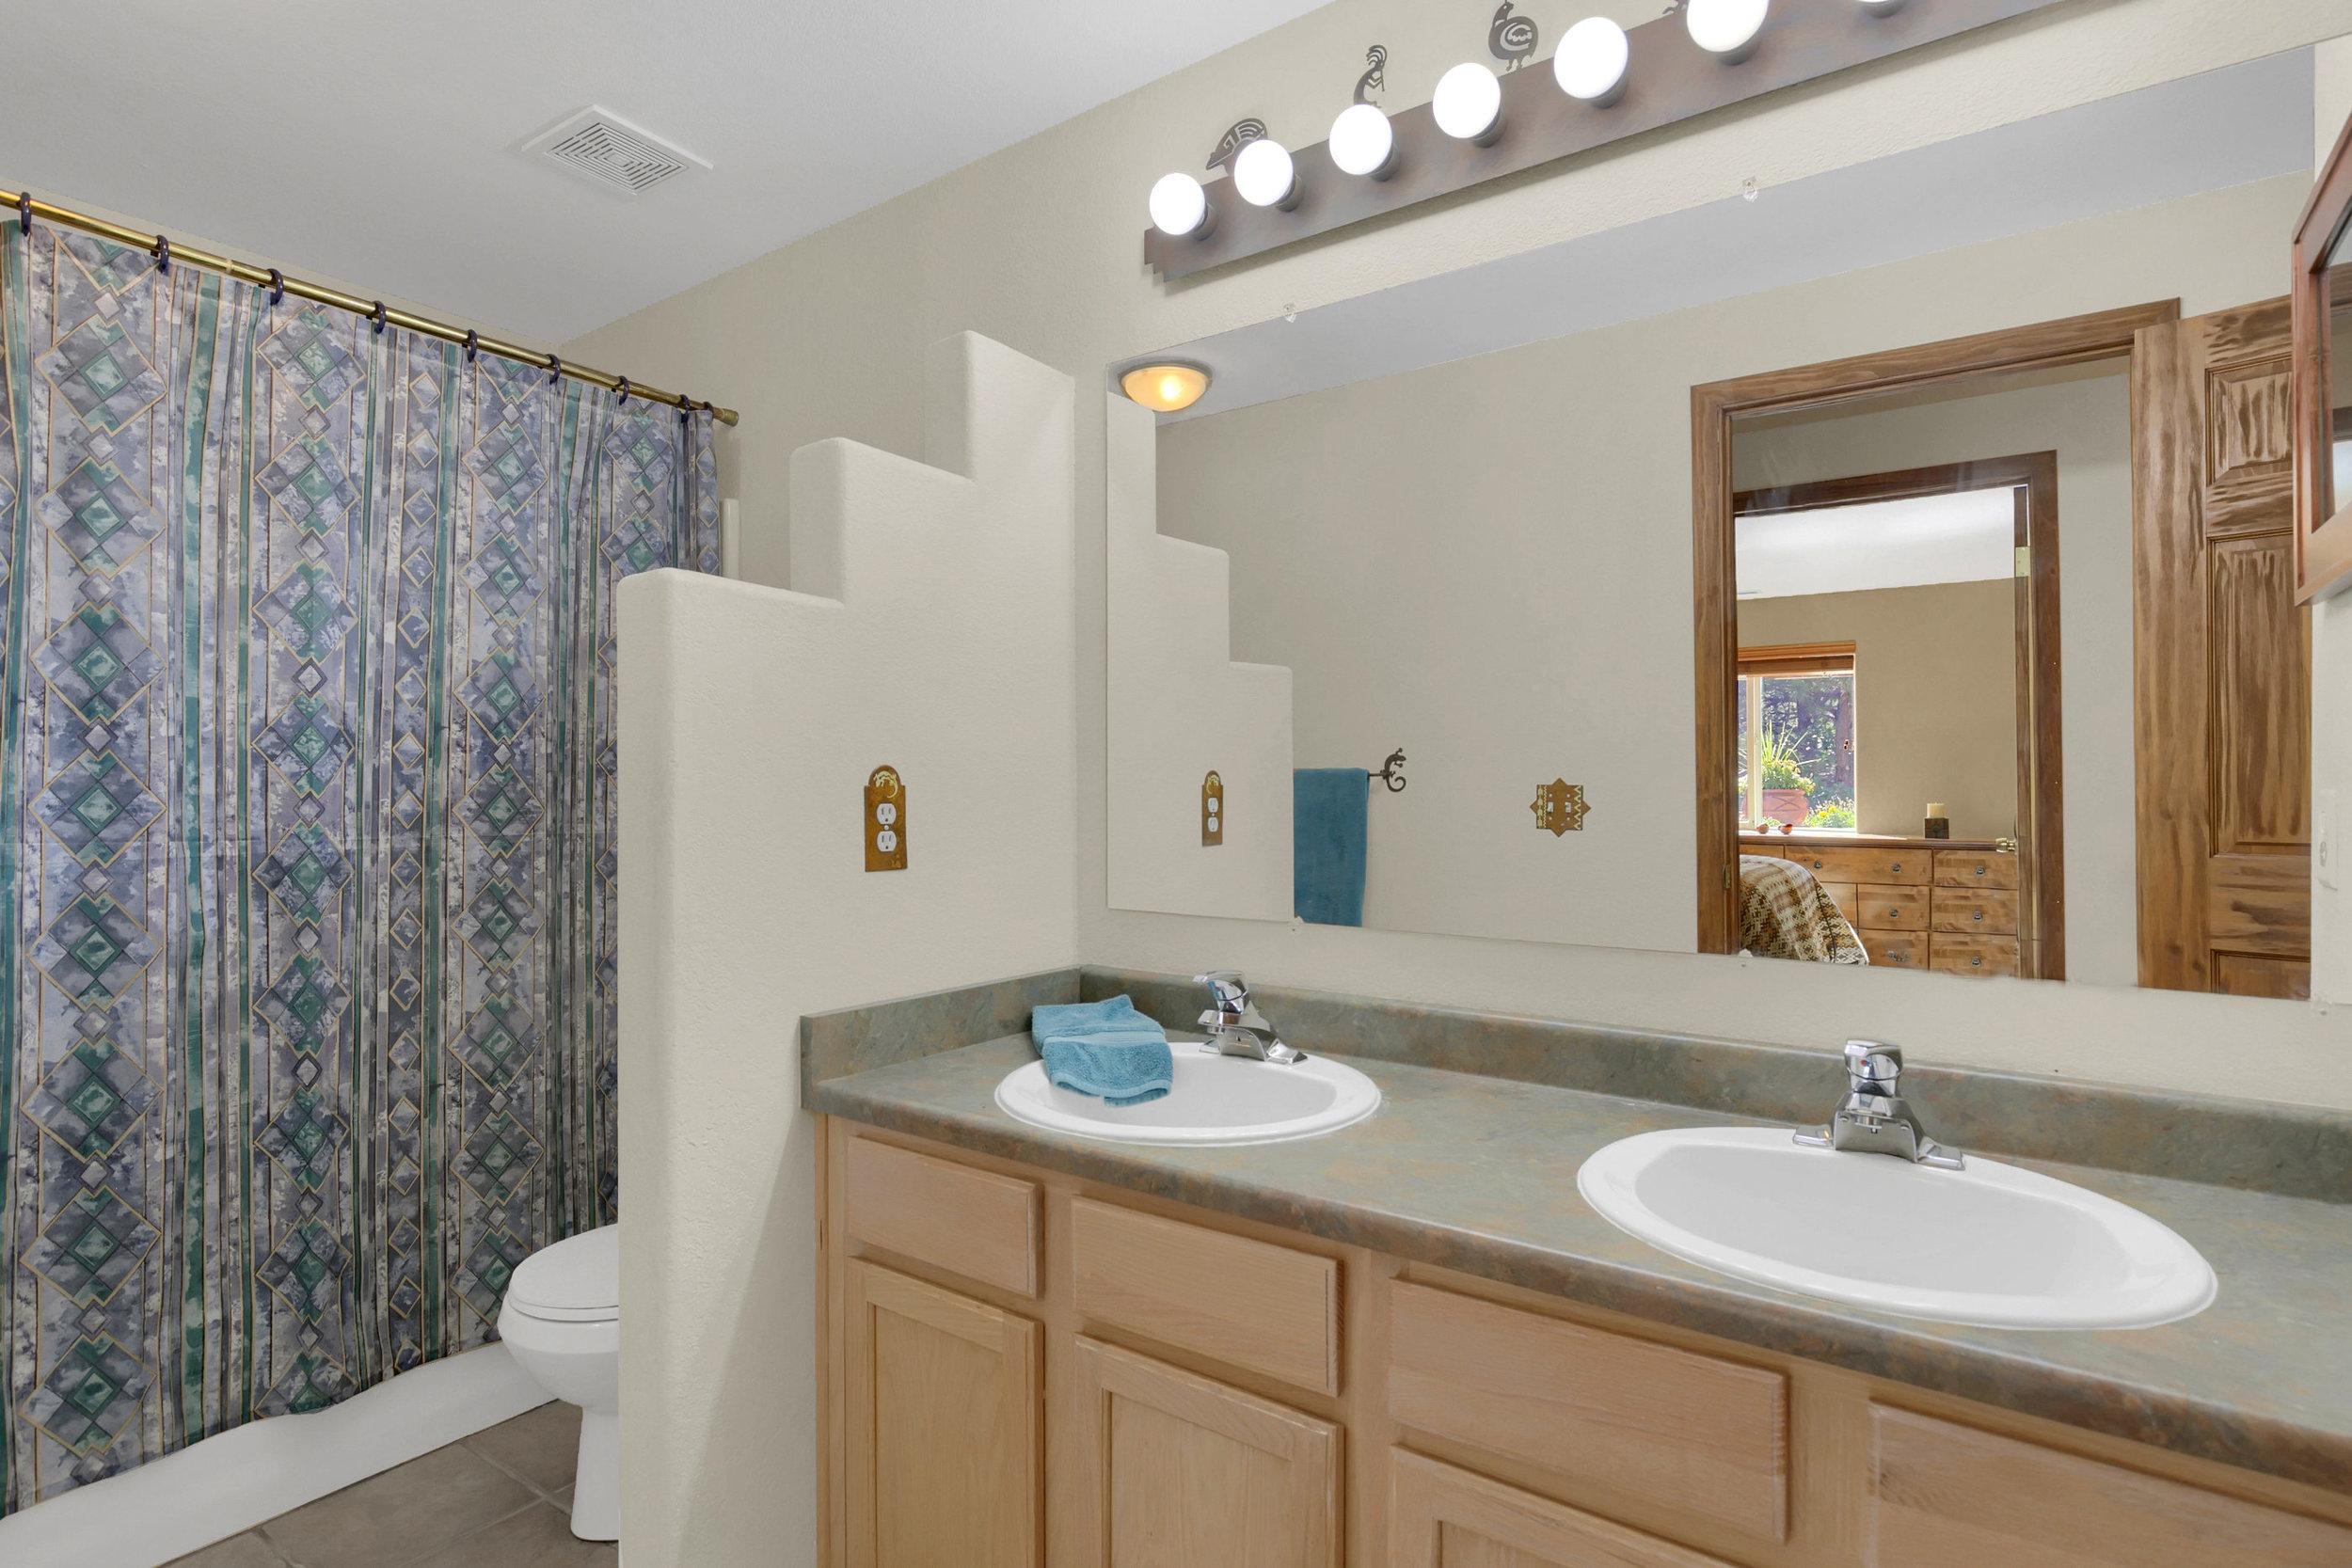 1605 Vickers Drive Colorado-print-030-022-Bathroom-2800x1867-300dpi.jpg